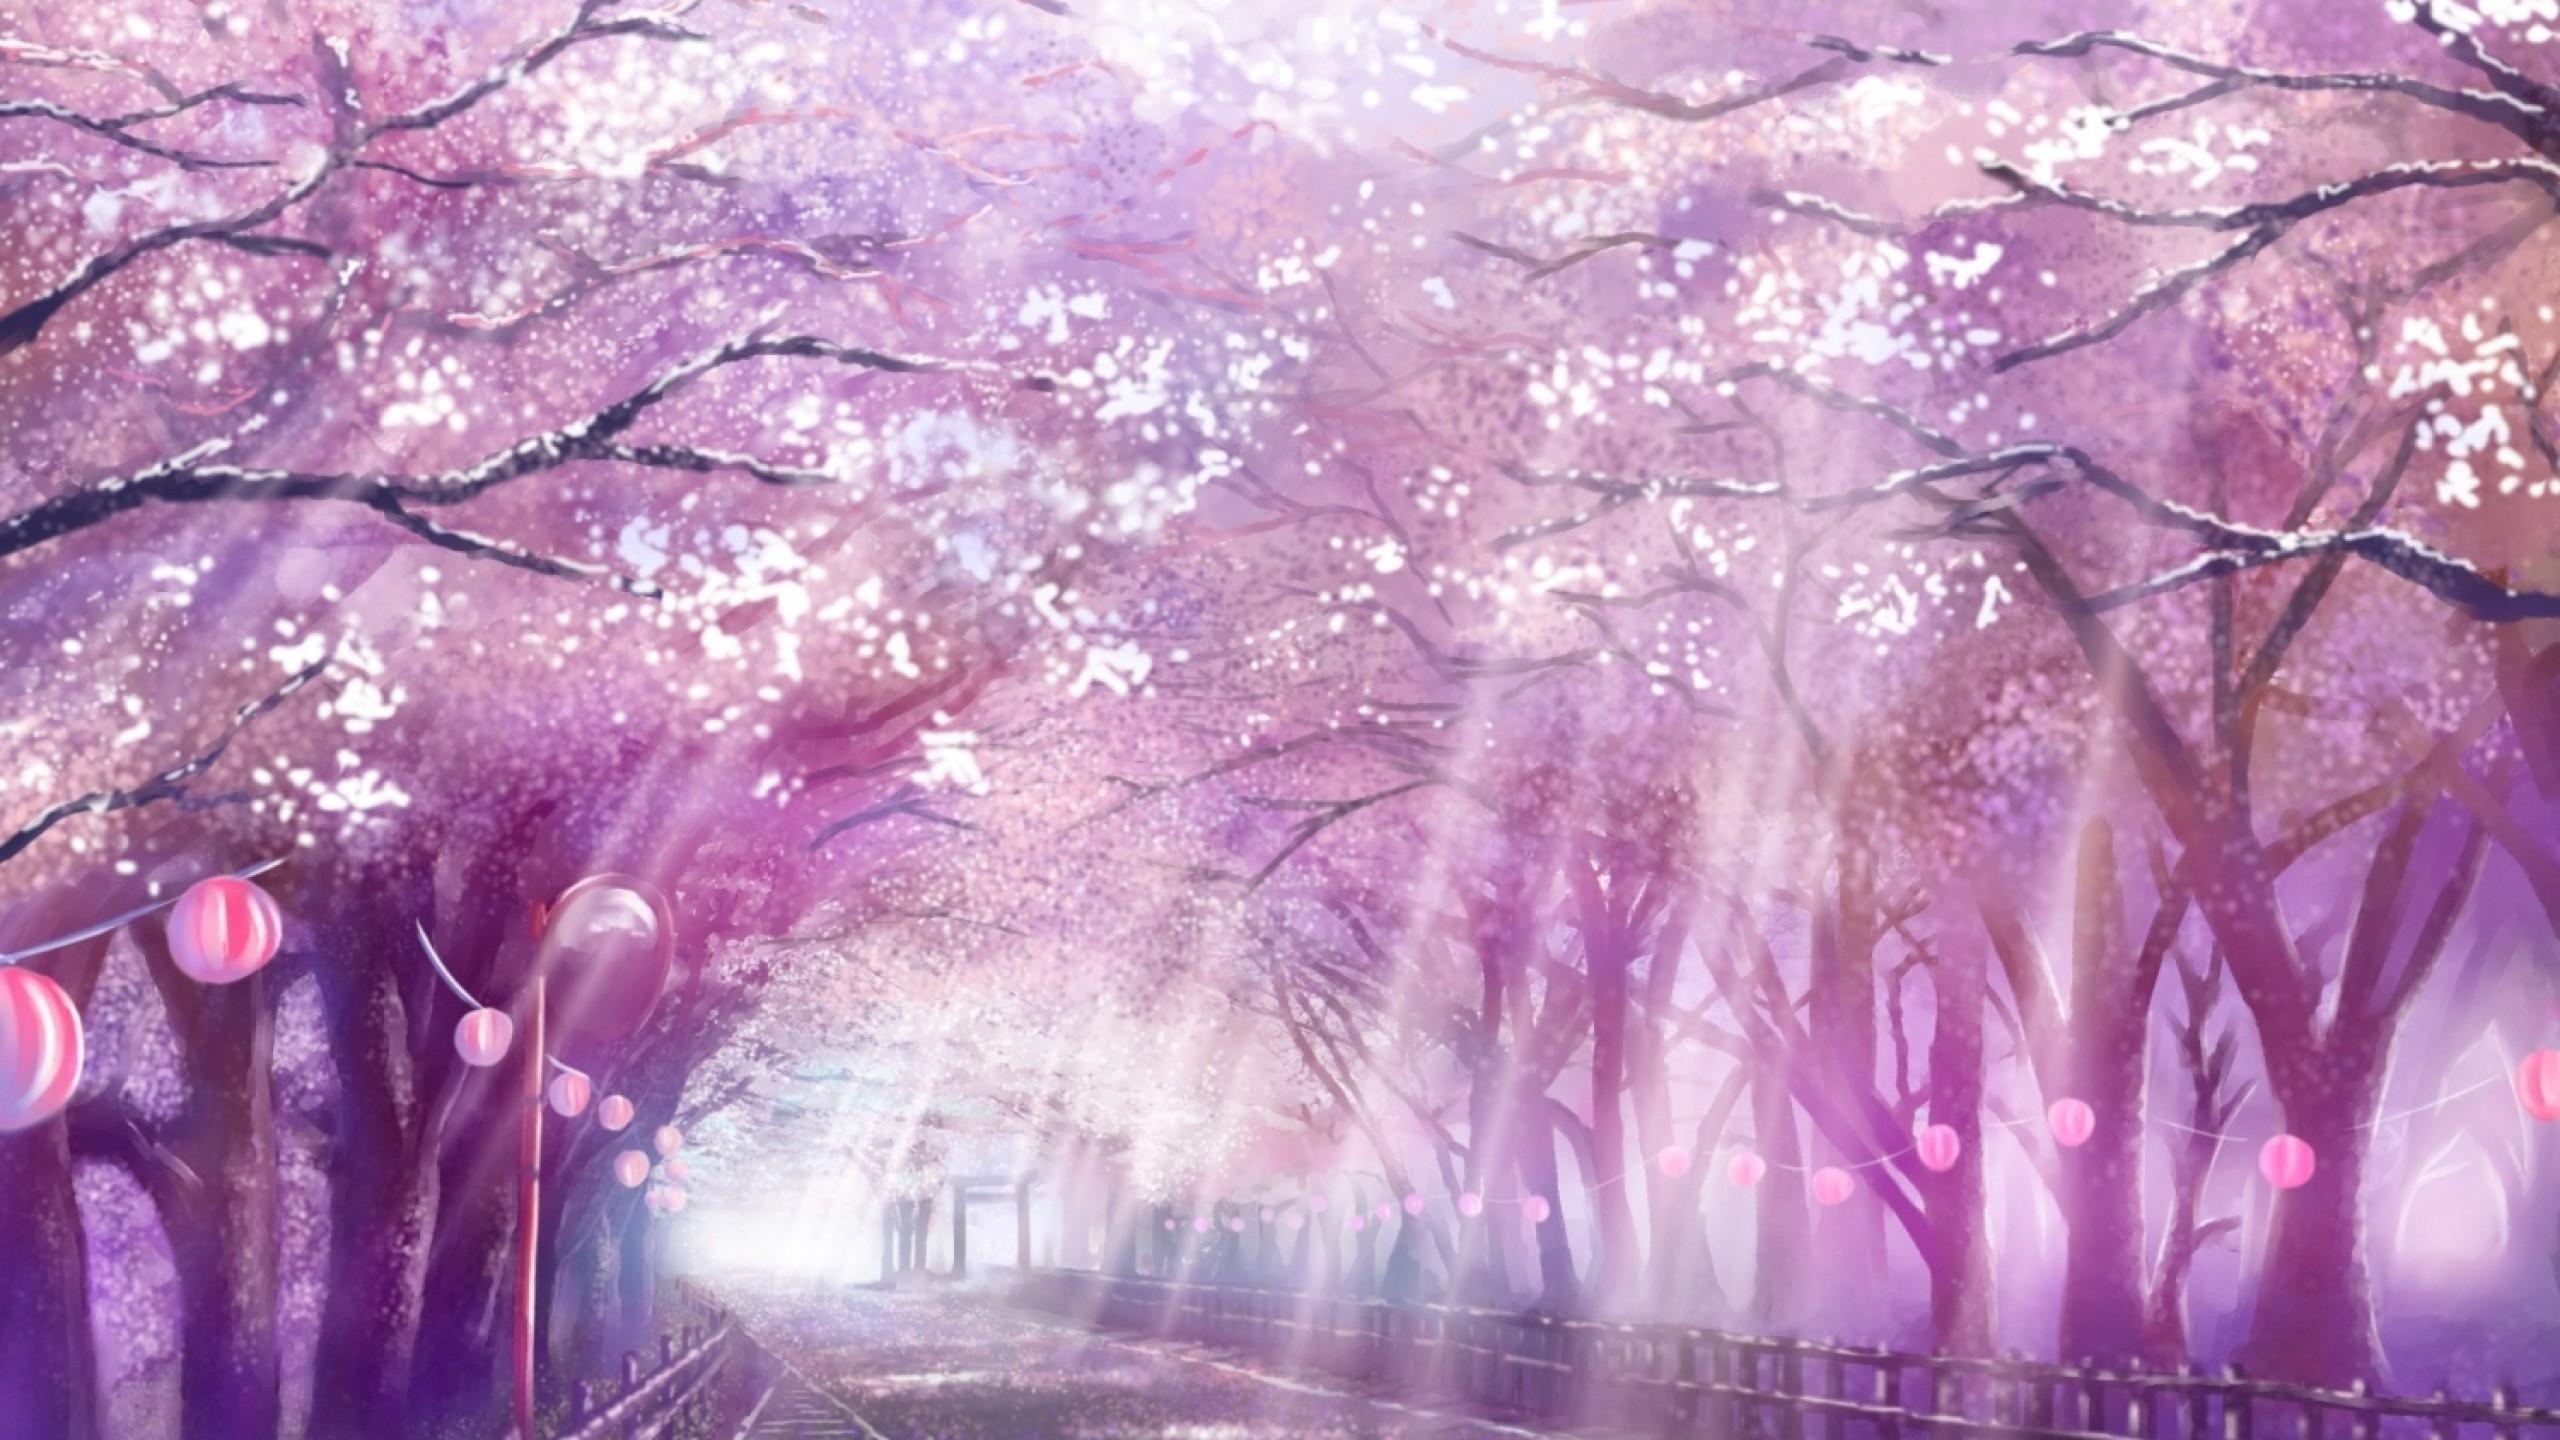 Anime Landscape, Scenic, Sakura Blossom, Cherry, Path, Sunlight